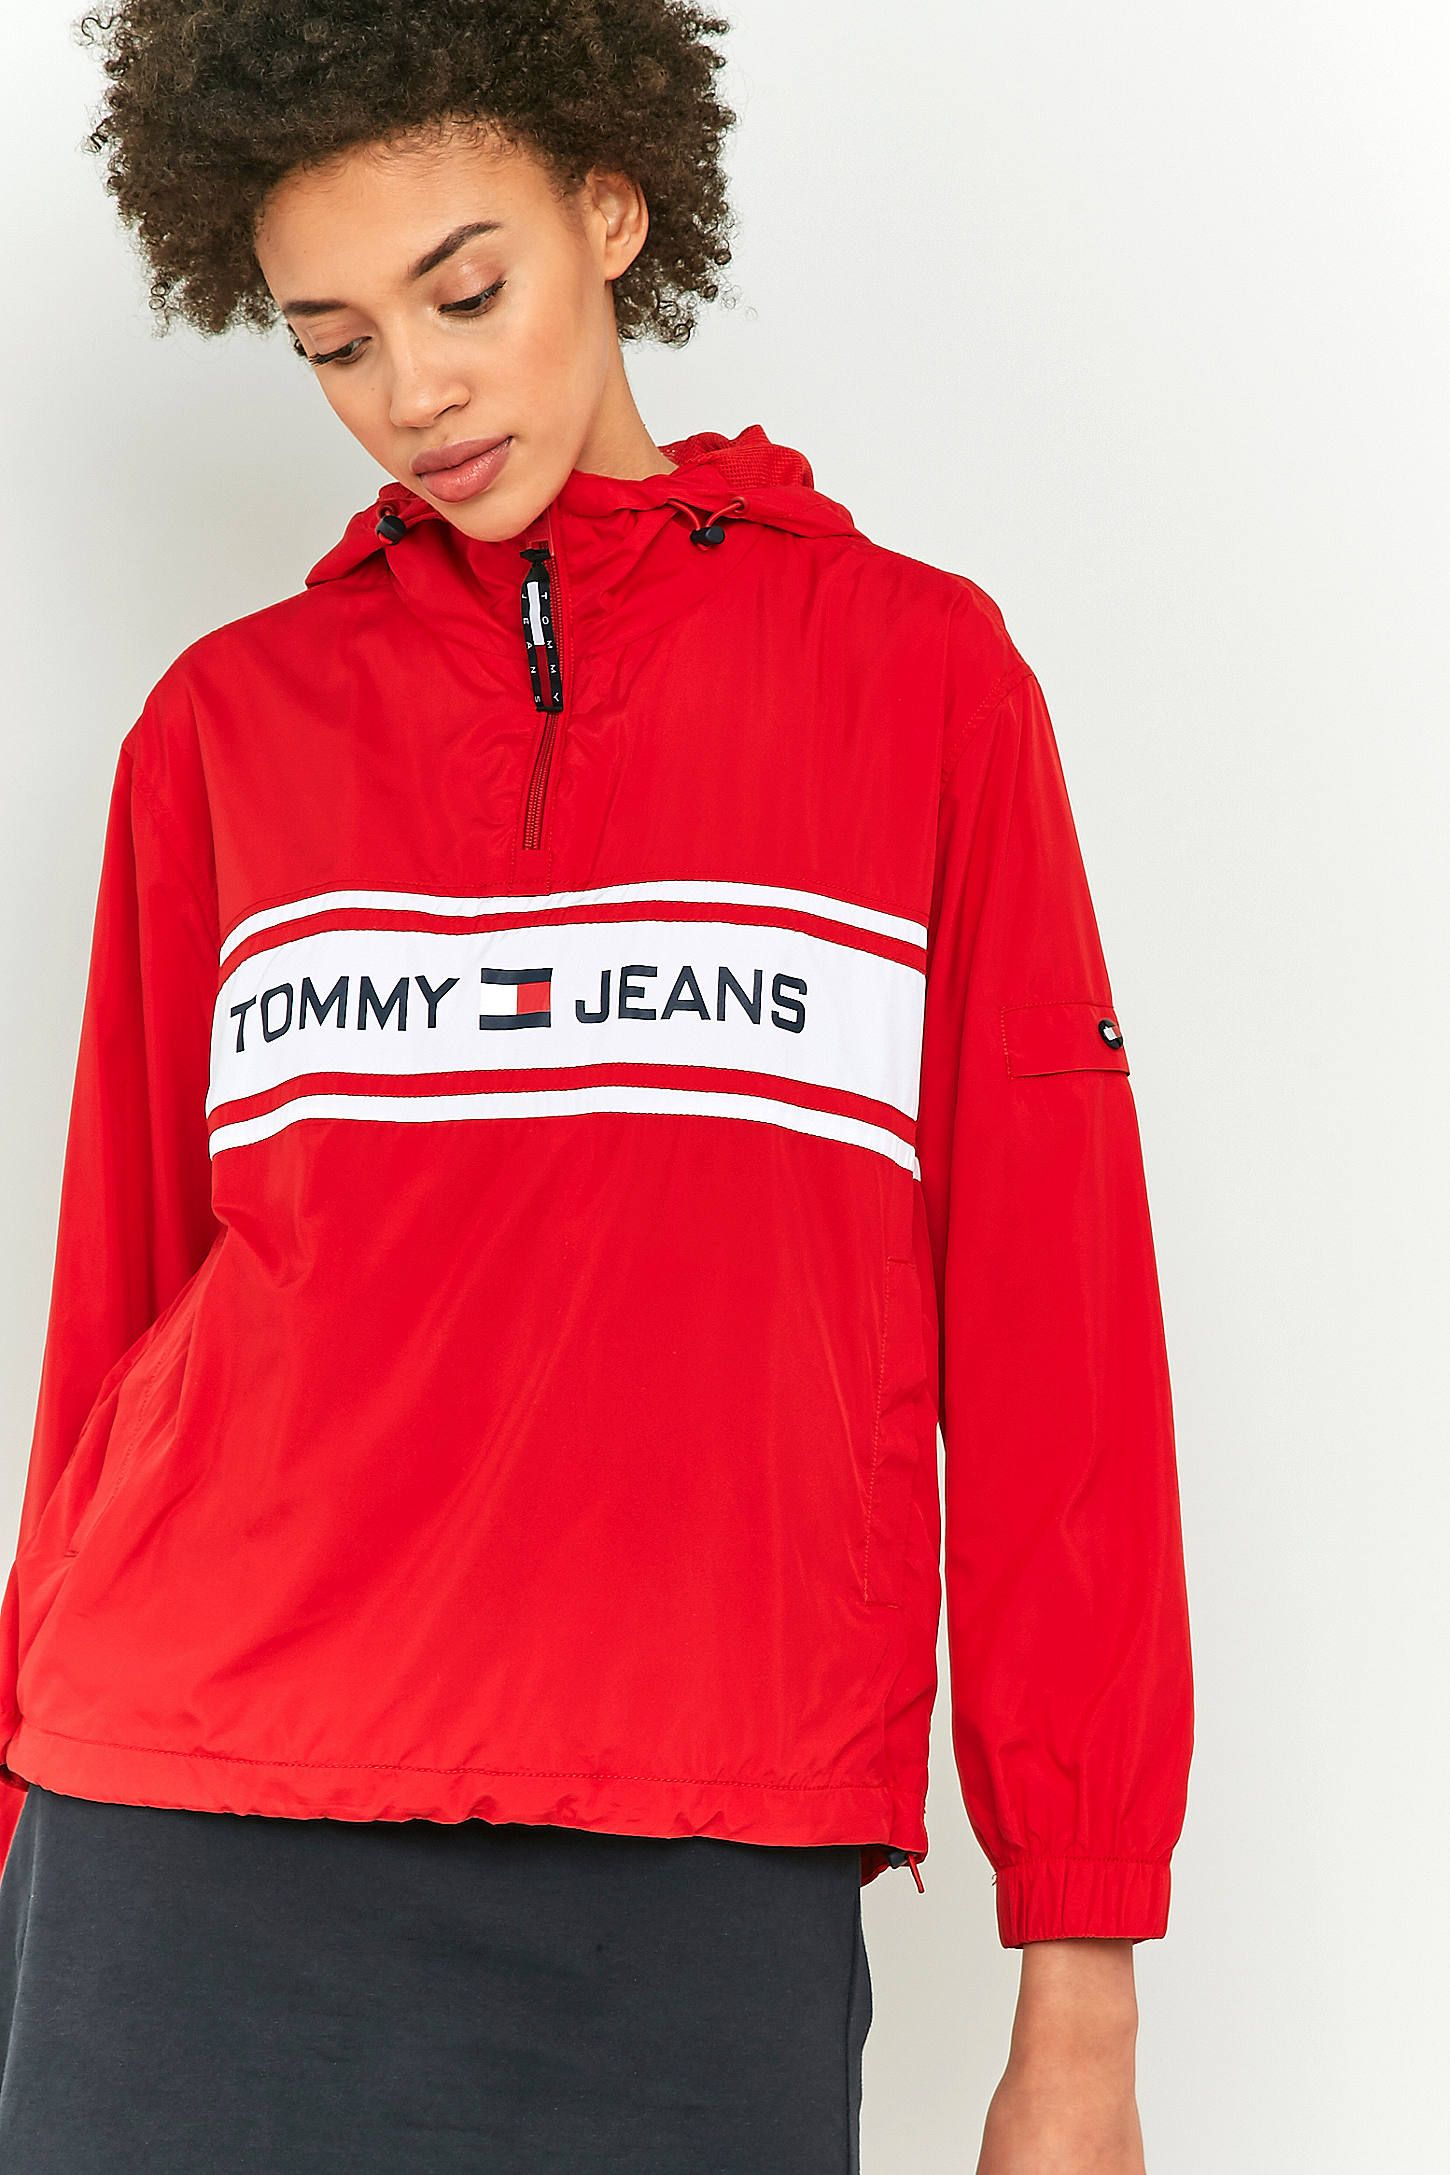 Tommy Jeans 90s Popover Jacket Tommy Jeans Sweatshirt Jacket Jackets